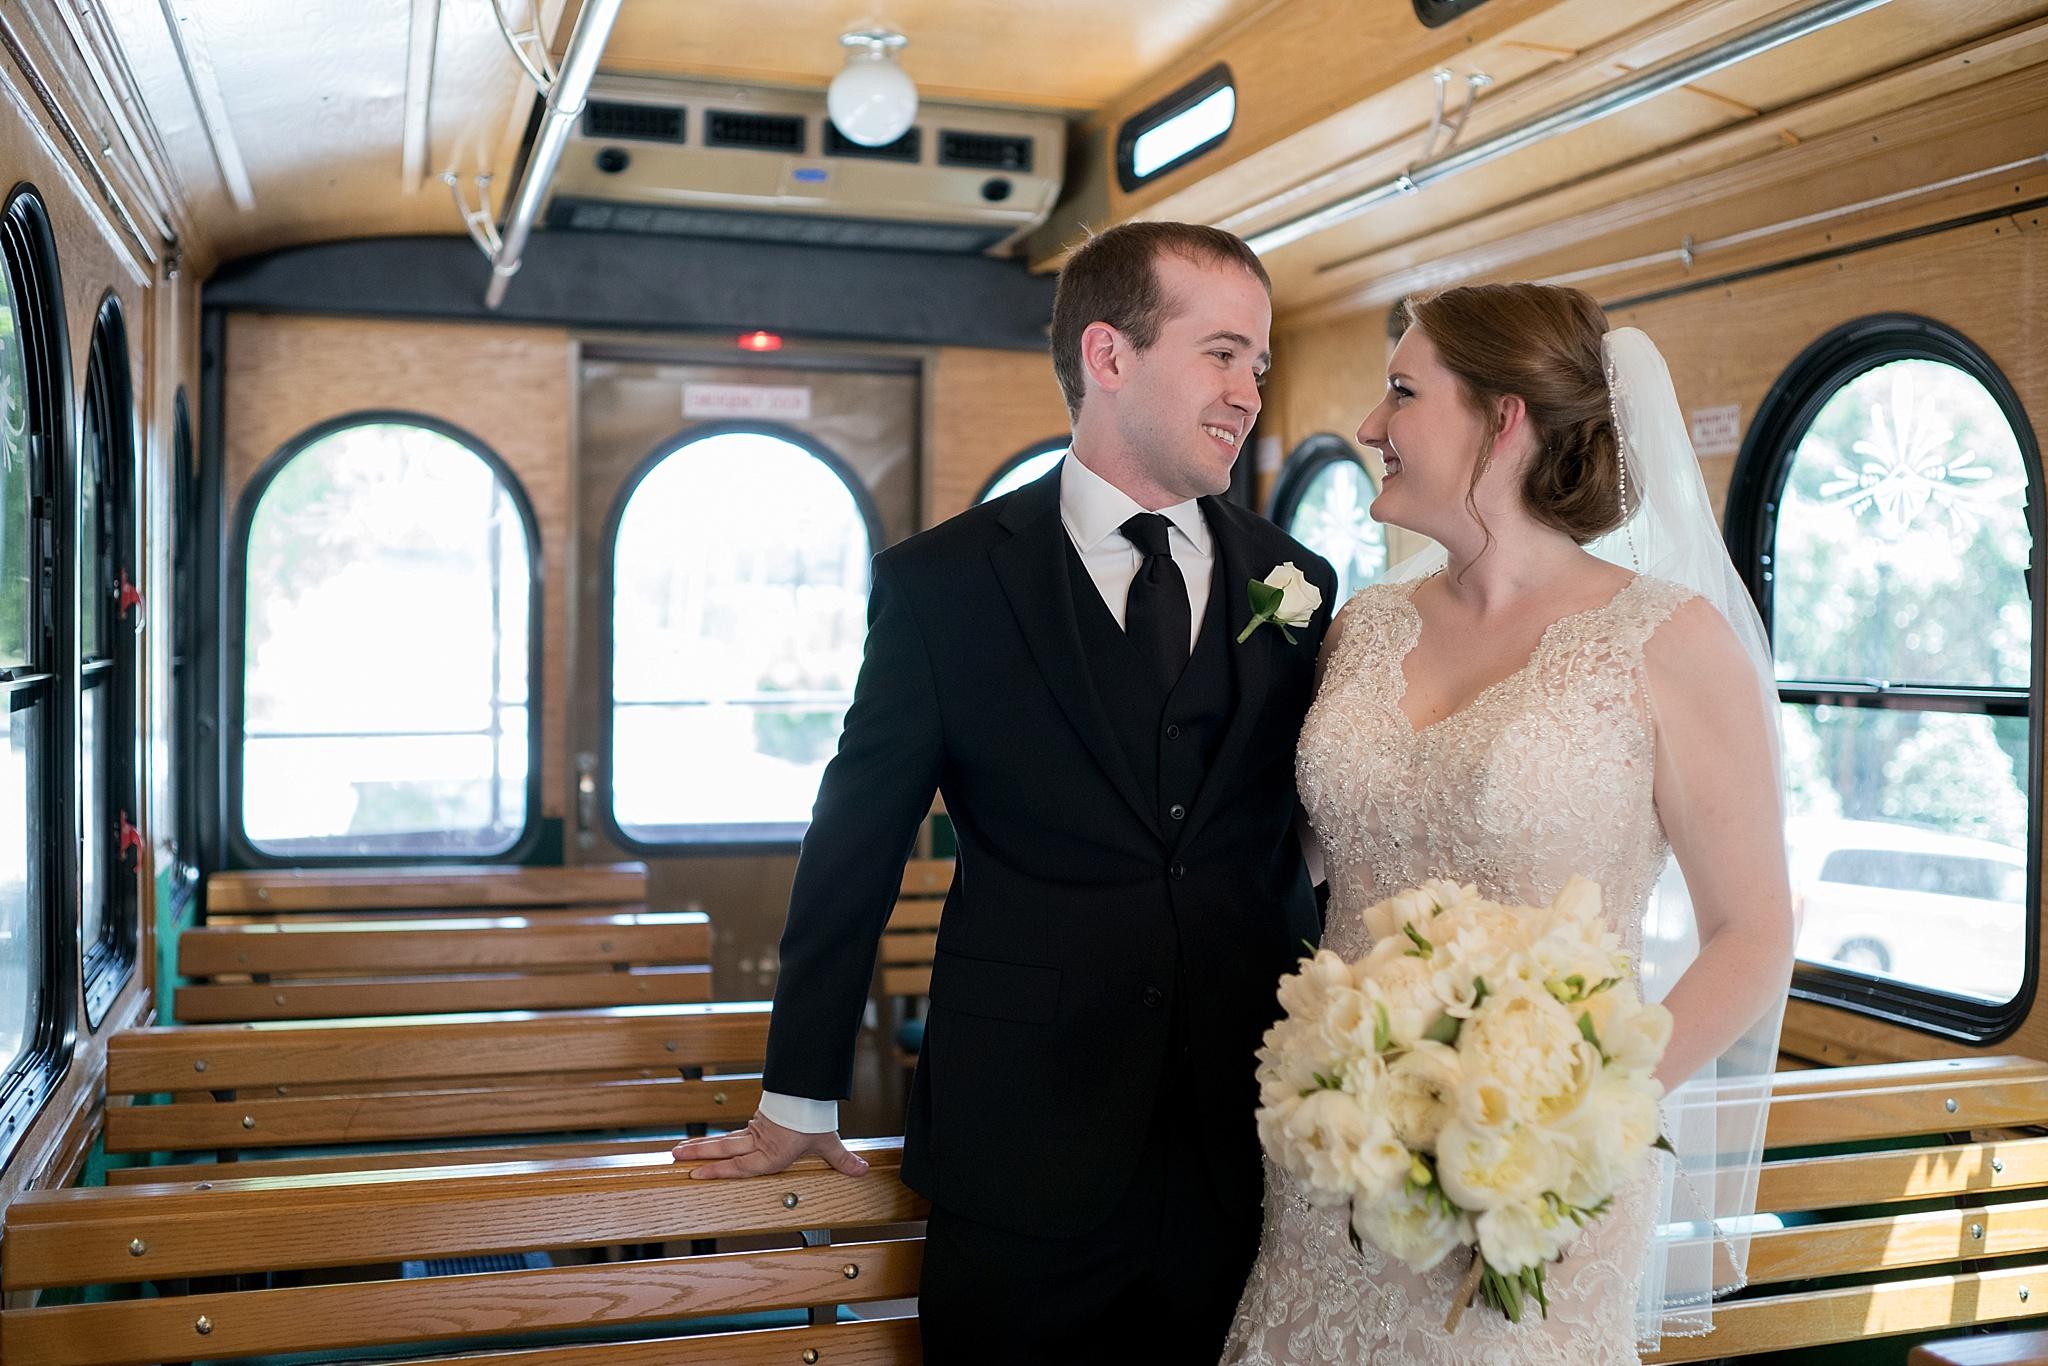 Pavilion-Carriage-Farms-Wedding-Photographer-183.jpg